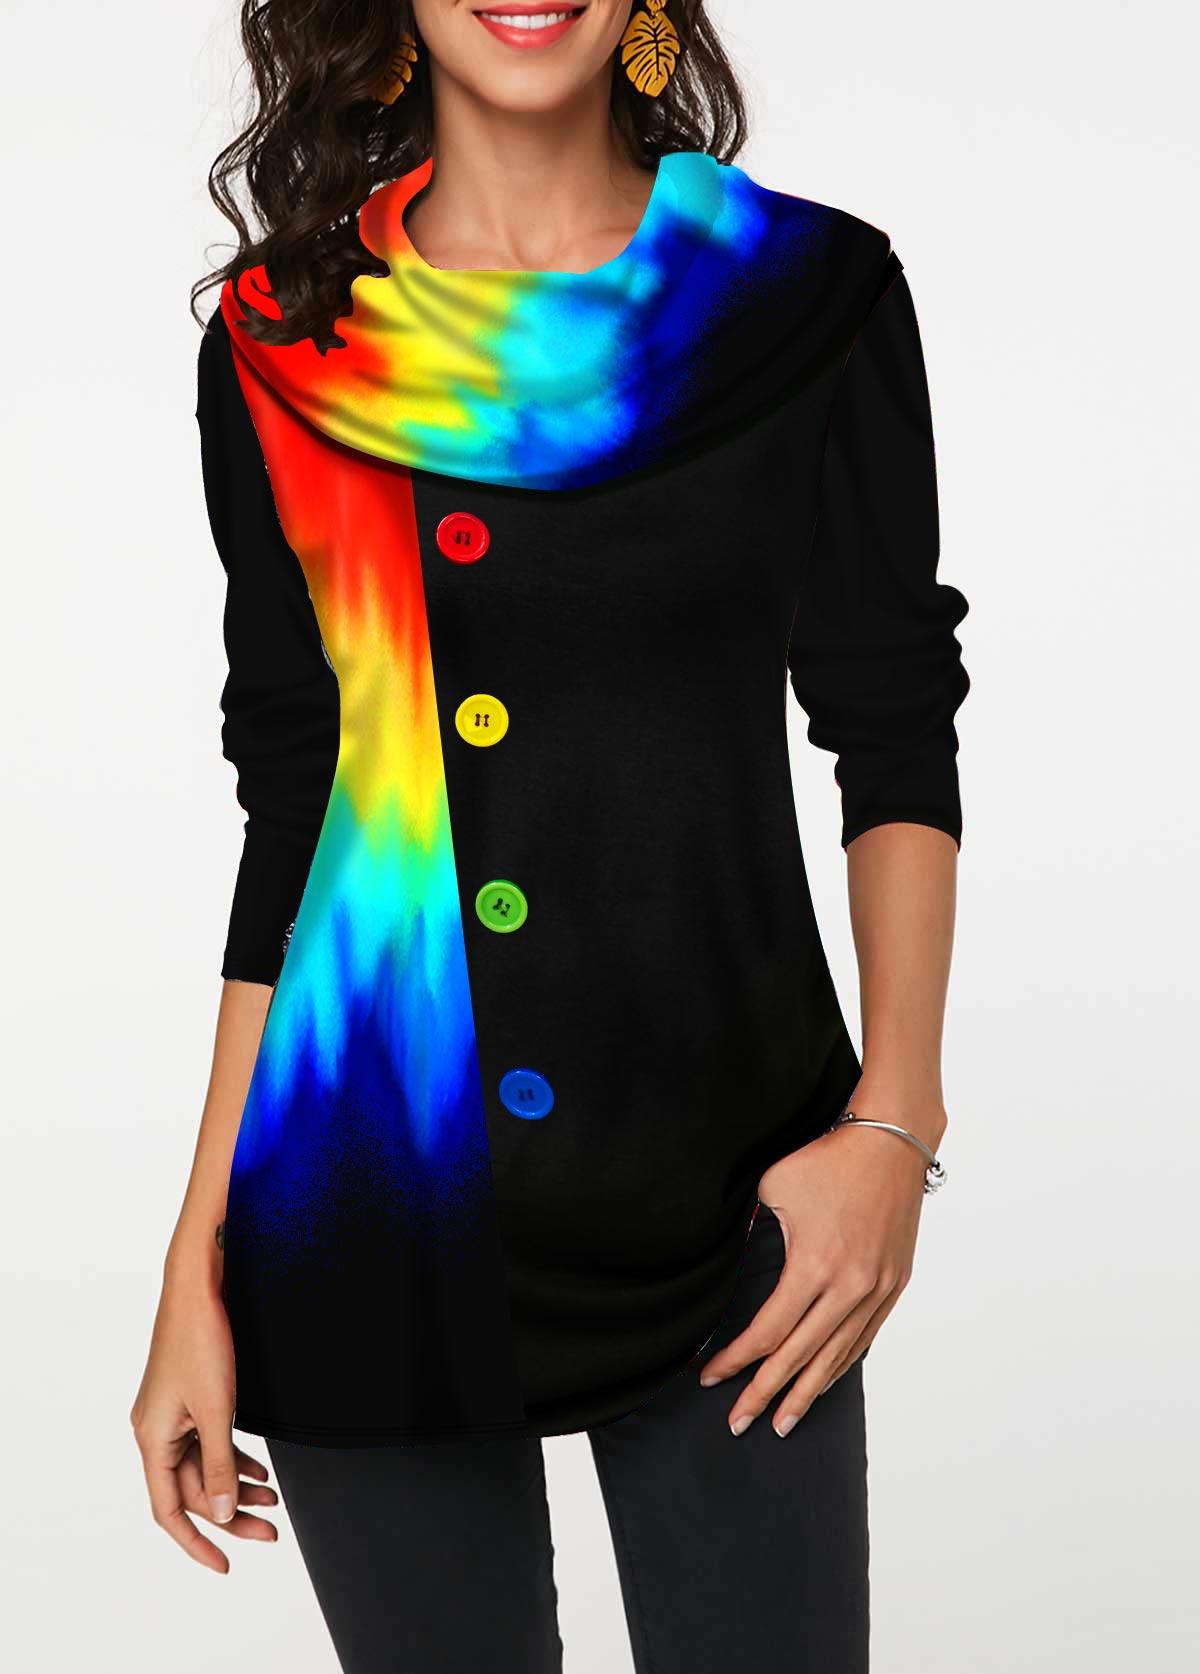 Colorful Printed Decorative Button Tunic Top